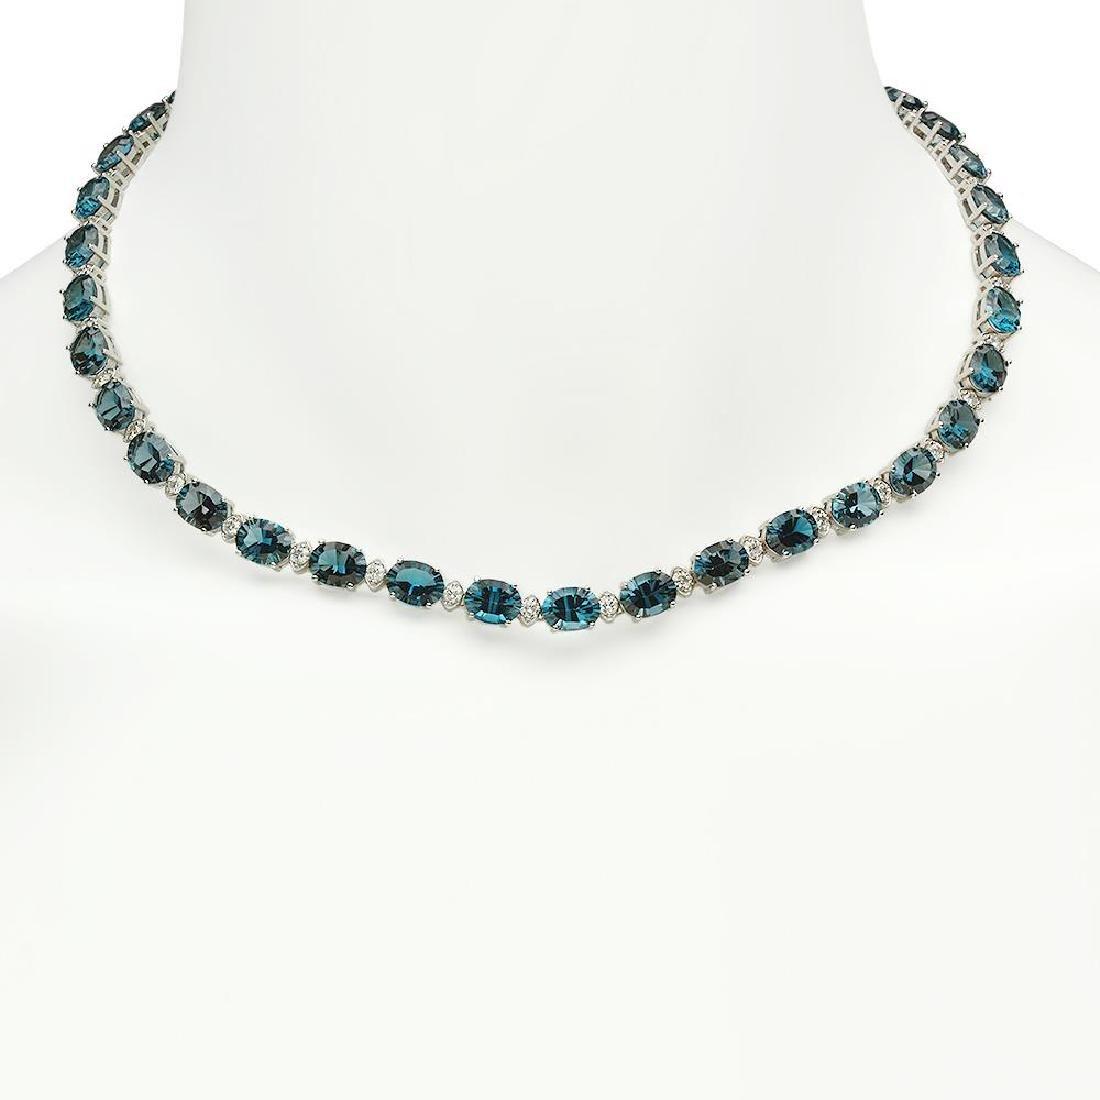 14K Gold 56.38ct Topaz 2.73ct Diamond Necklace